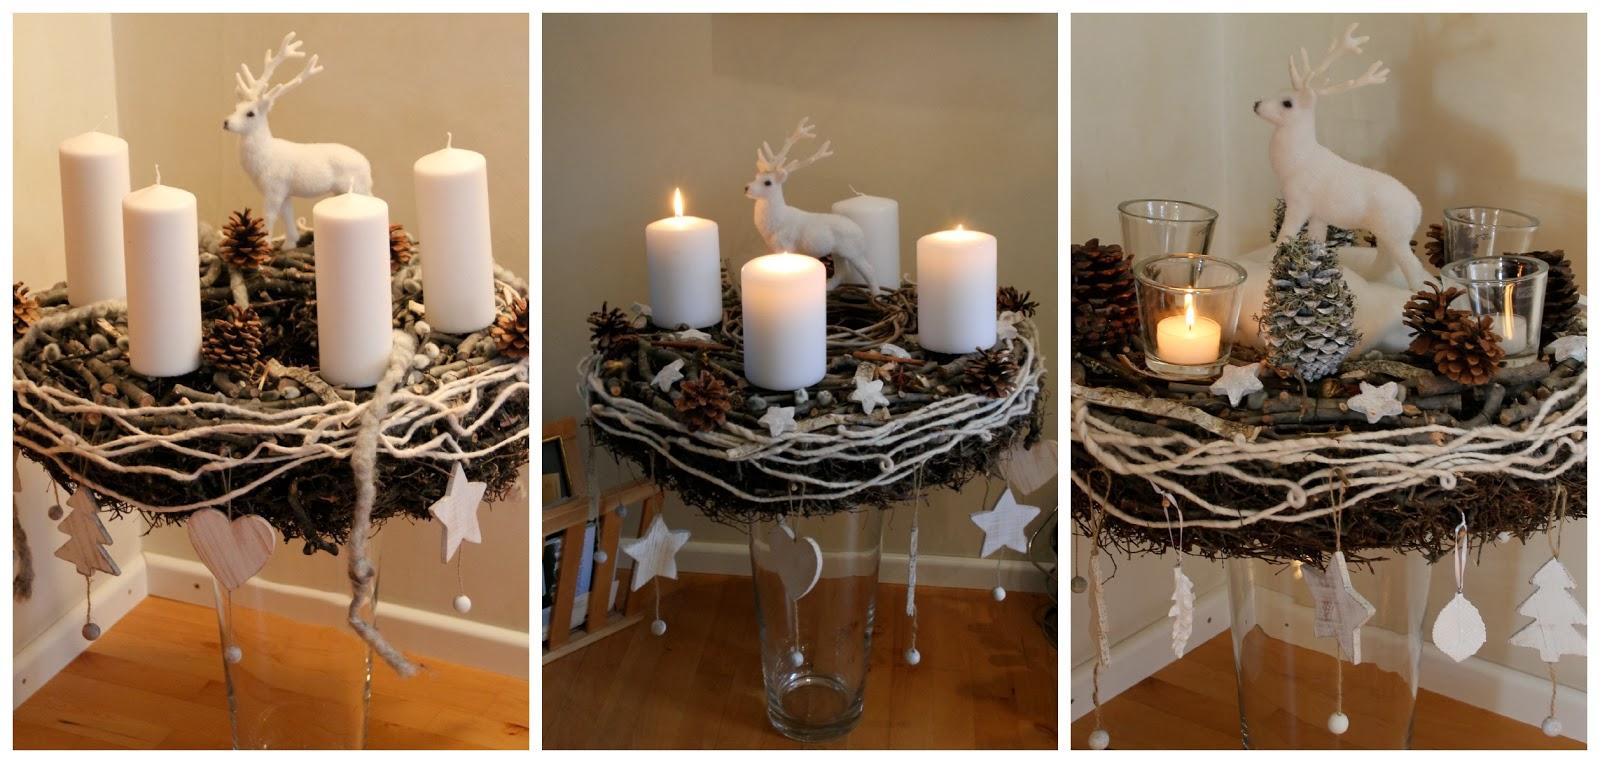 deko hoch drei november 2013. Black Bedroom Furniture Sets. Home Design Ideas